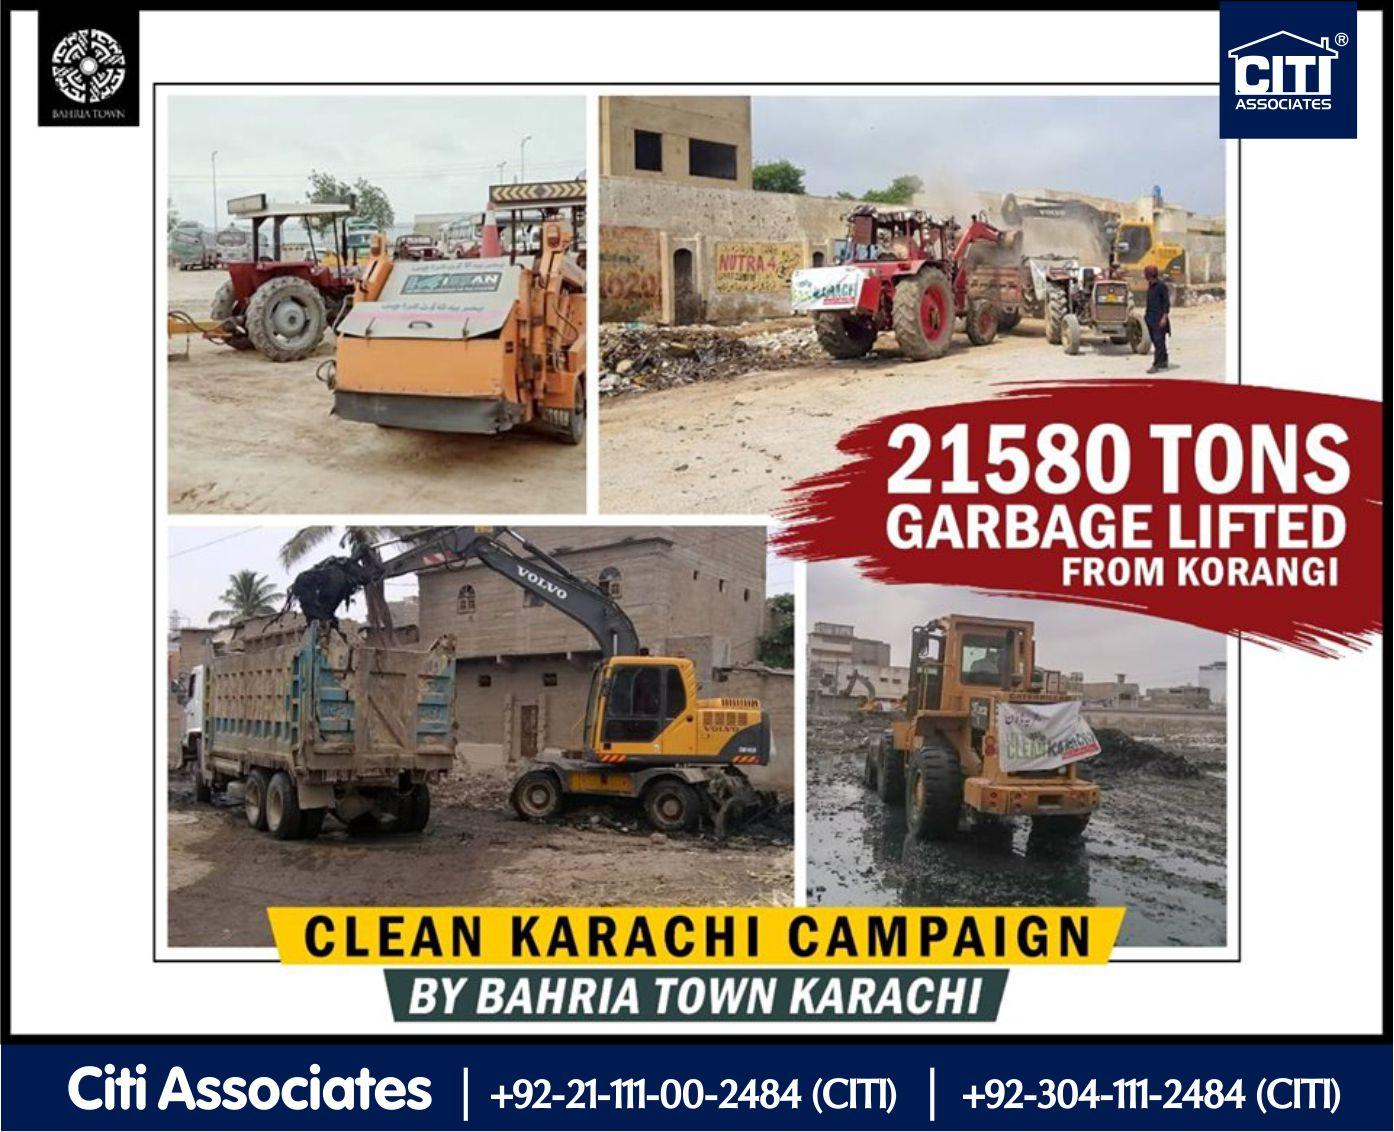 21580 Tons Garbage Lifted from Korangi by Bahria Town Karachi